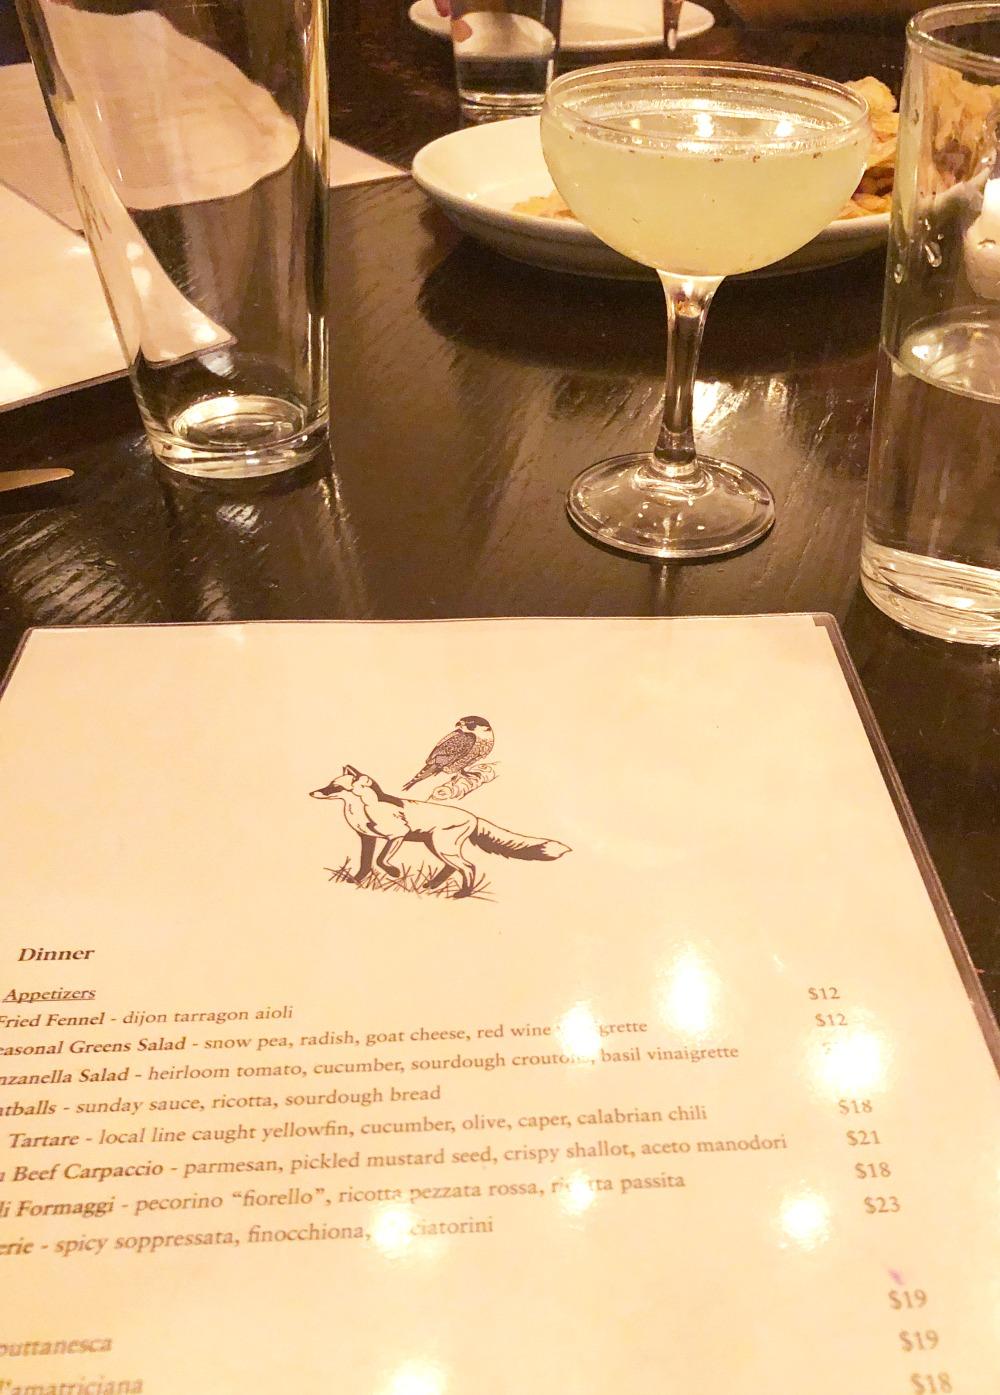 Photo Diary I South Orange New Jersey Fox and the Falcon Restaurant Martini #Travel #travelblogger